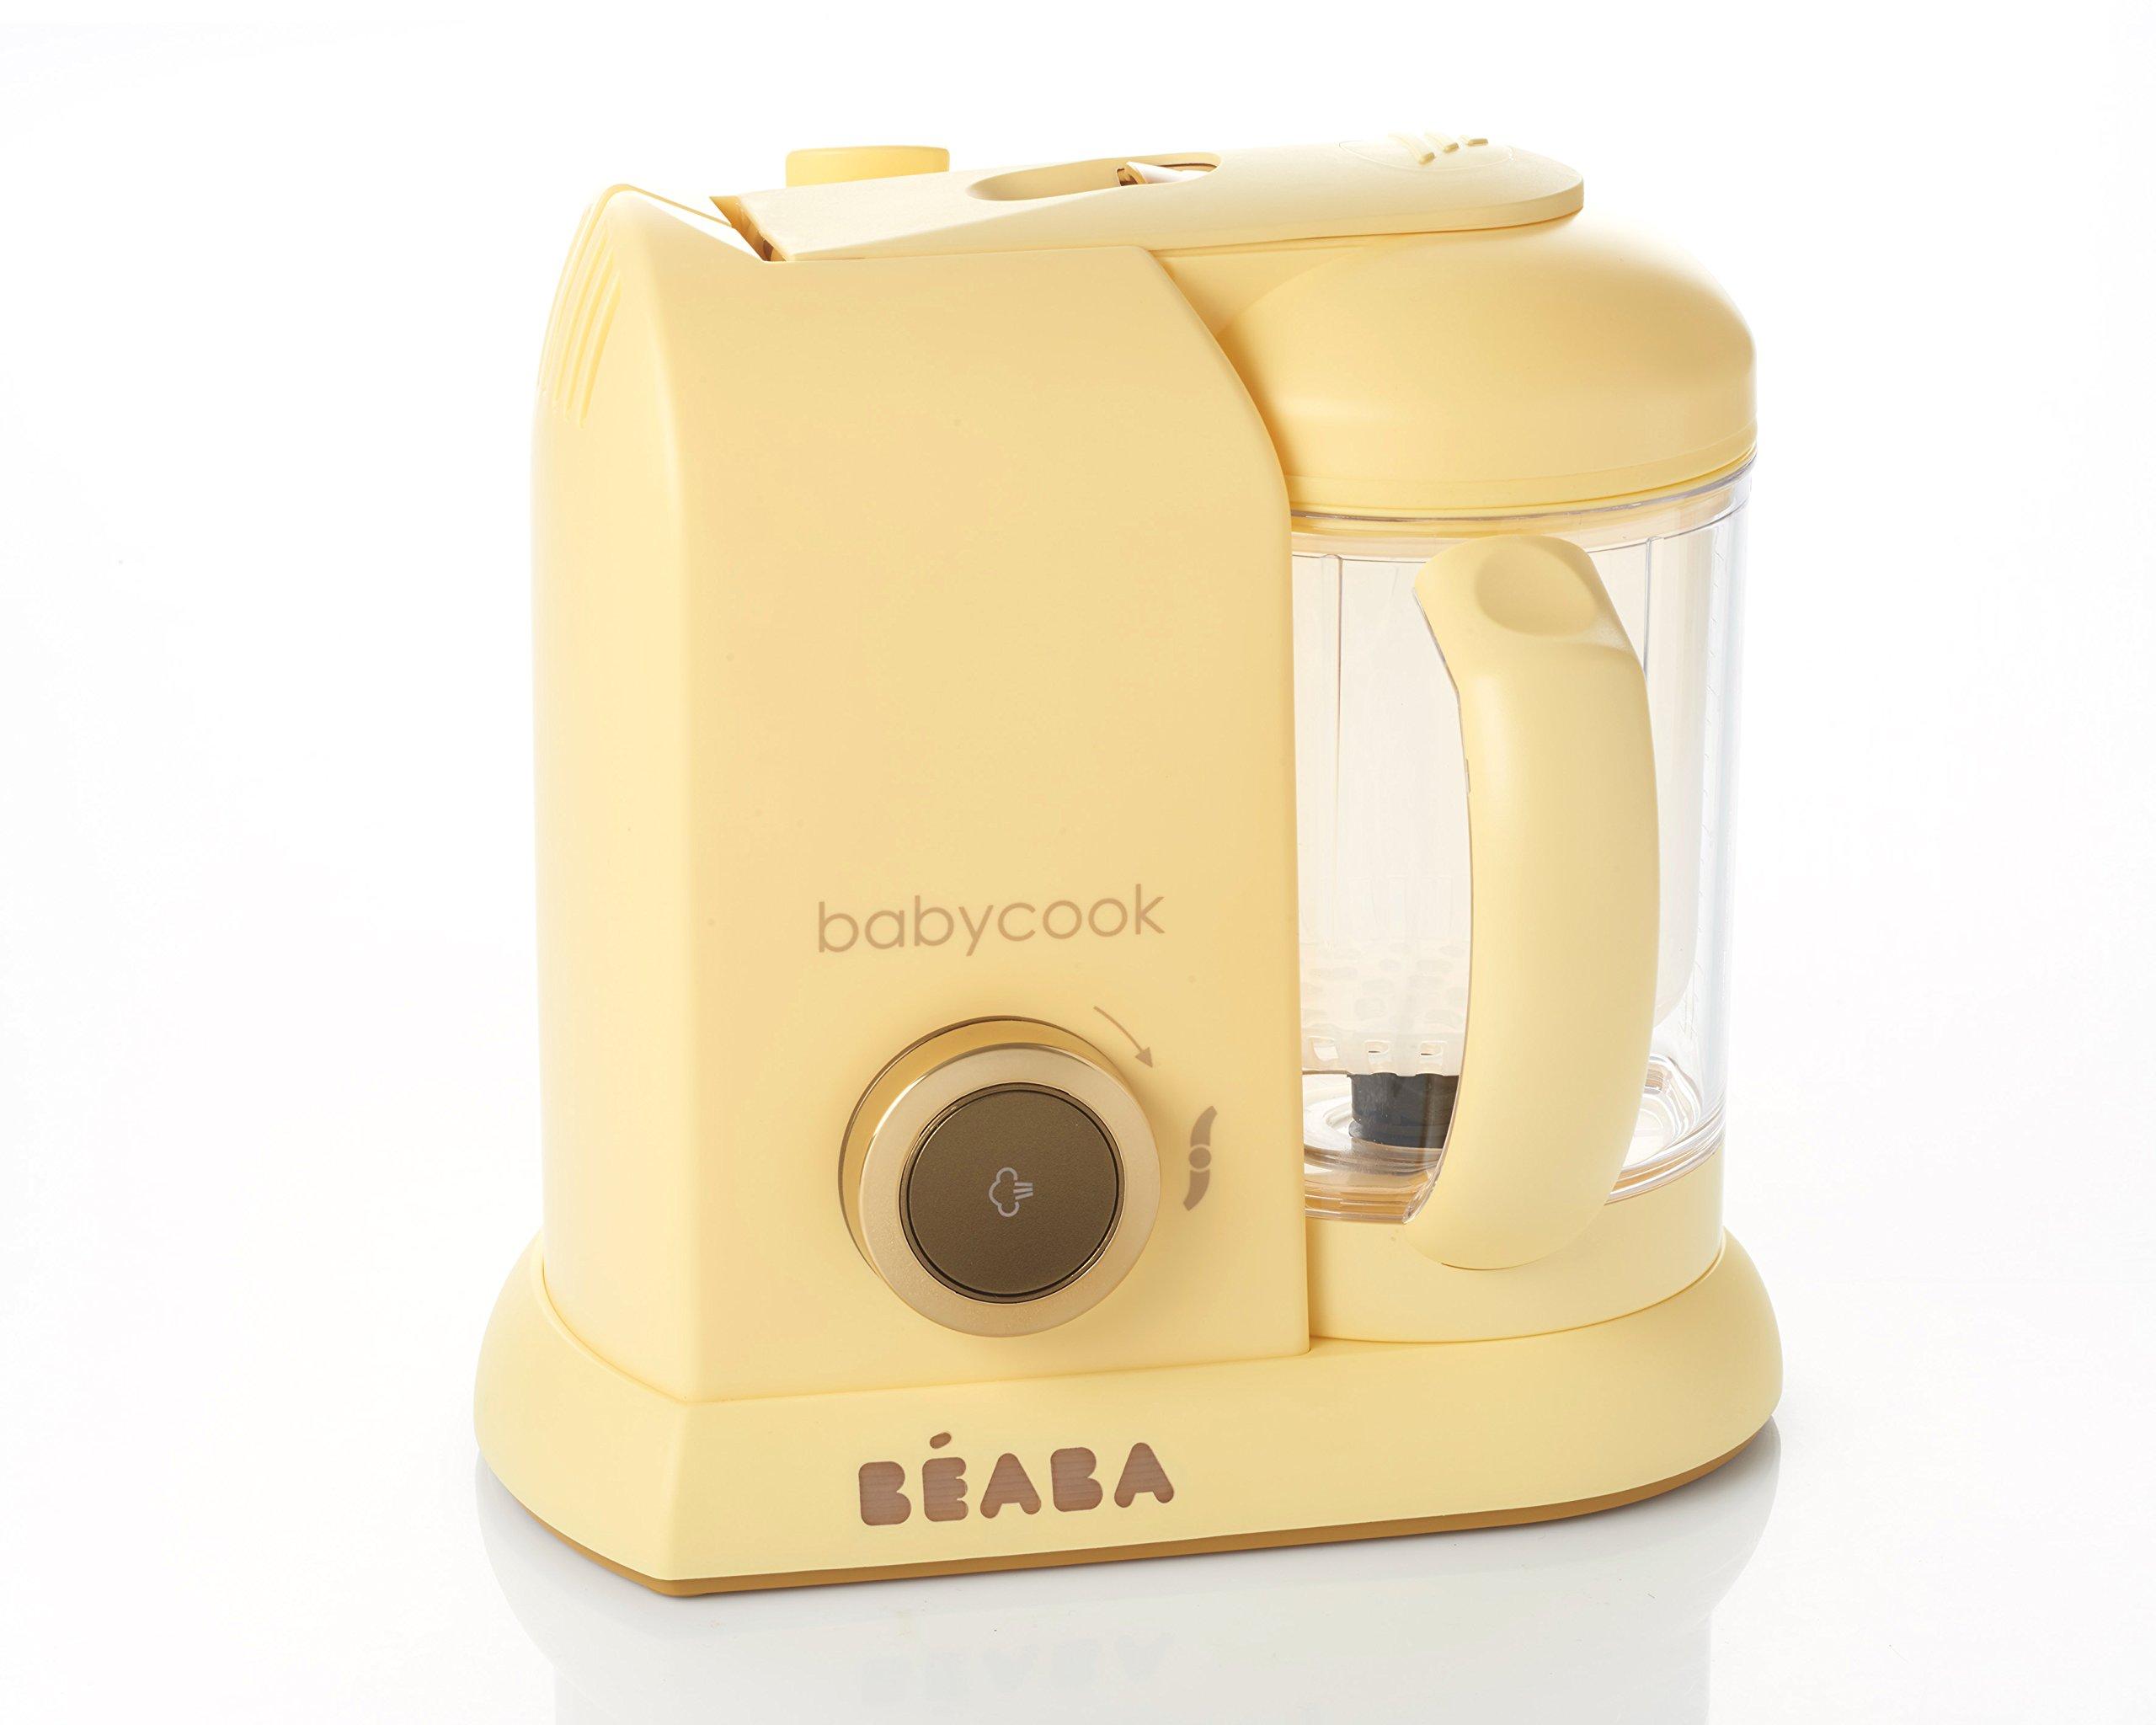 BEABA Babycook Macaron 4 in 1 Steam Cooker & Blender and Dishwasher Safe, 4.5 Cups, Lemon